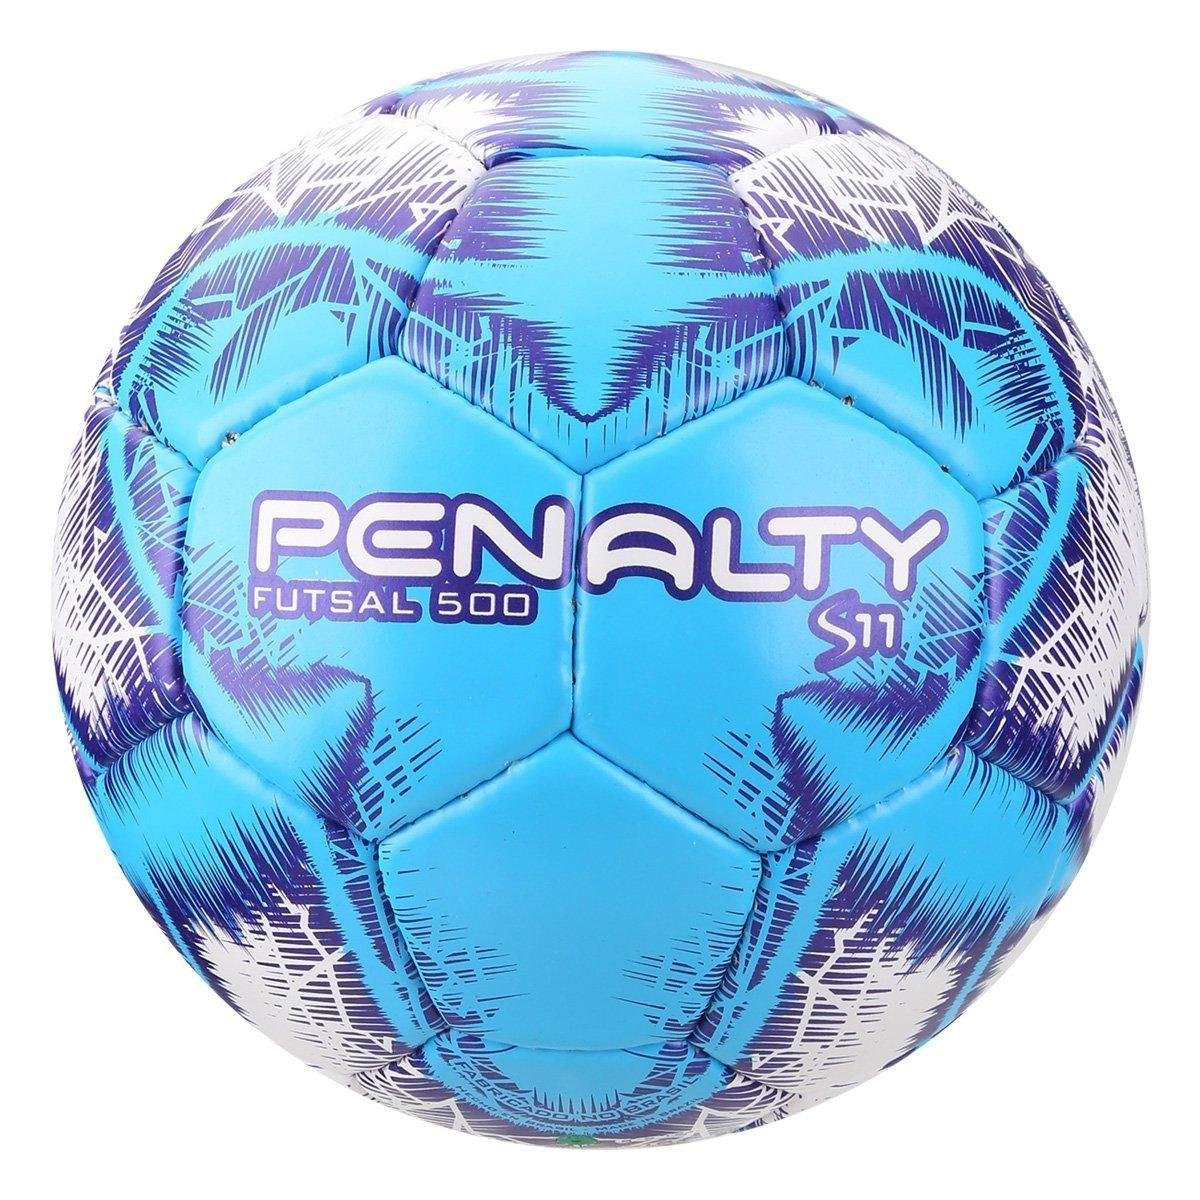 Bola Futsal Penalty S11 R4 500 LX 683861899a228